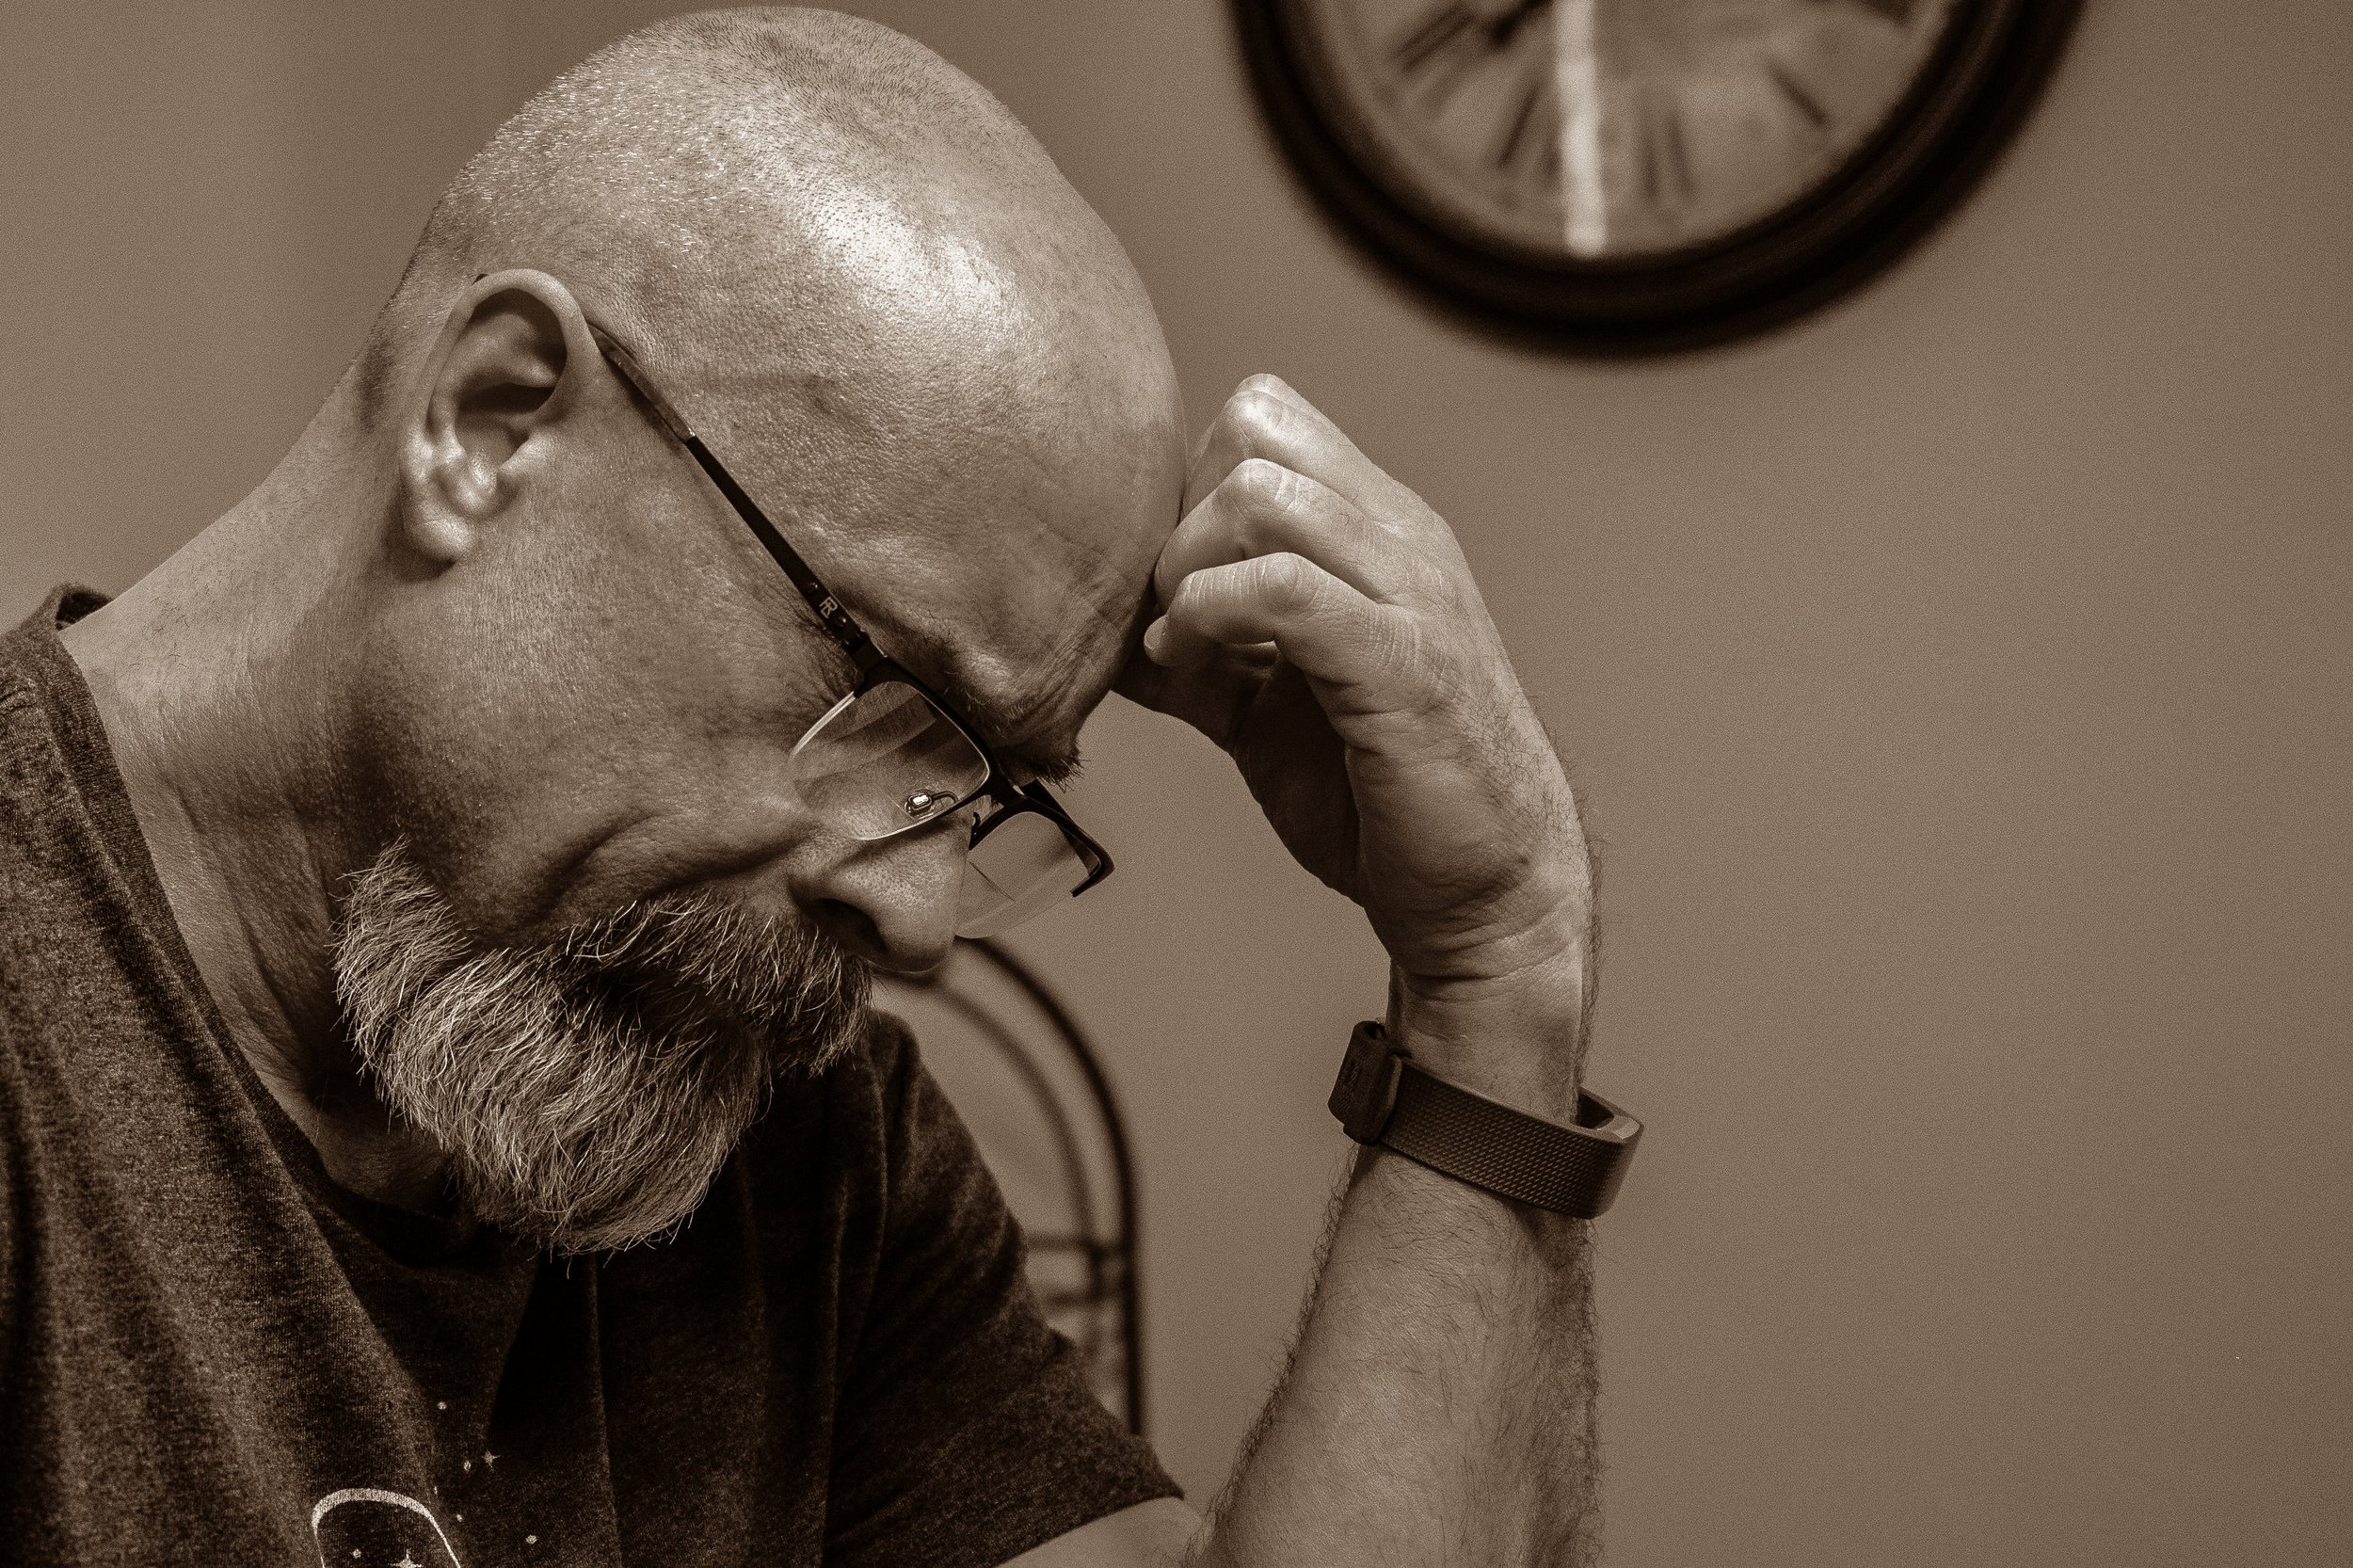 adult-bald-beard-1194196.jpg